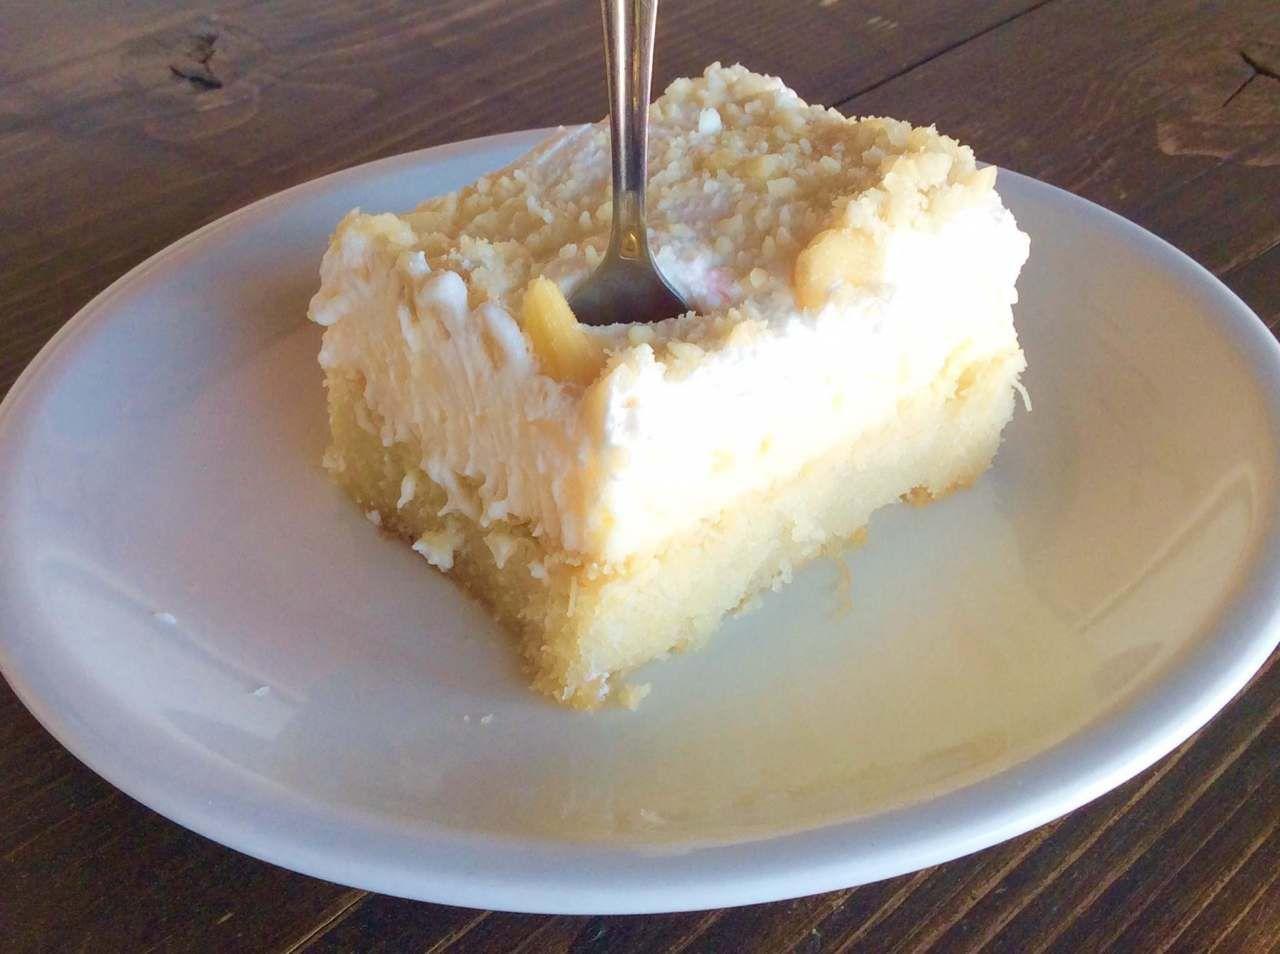 Ekmek Kataifi Candy Desserts Kochrezepte Rezepte